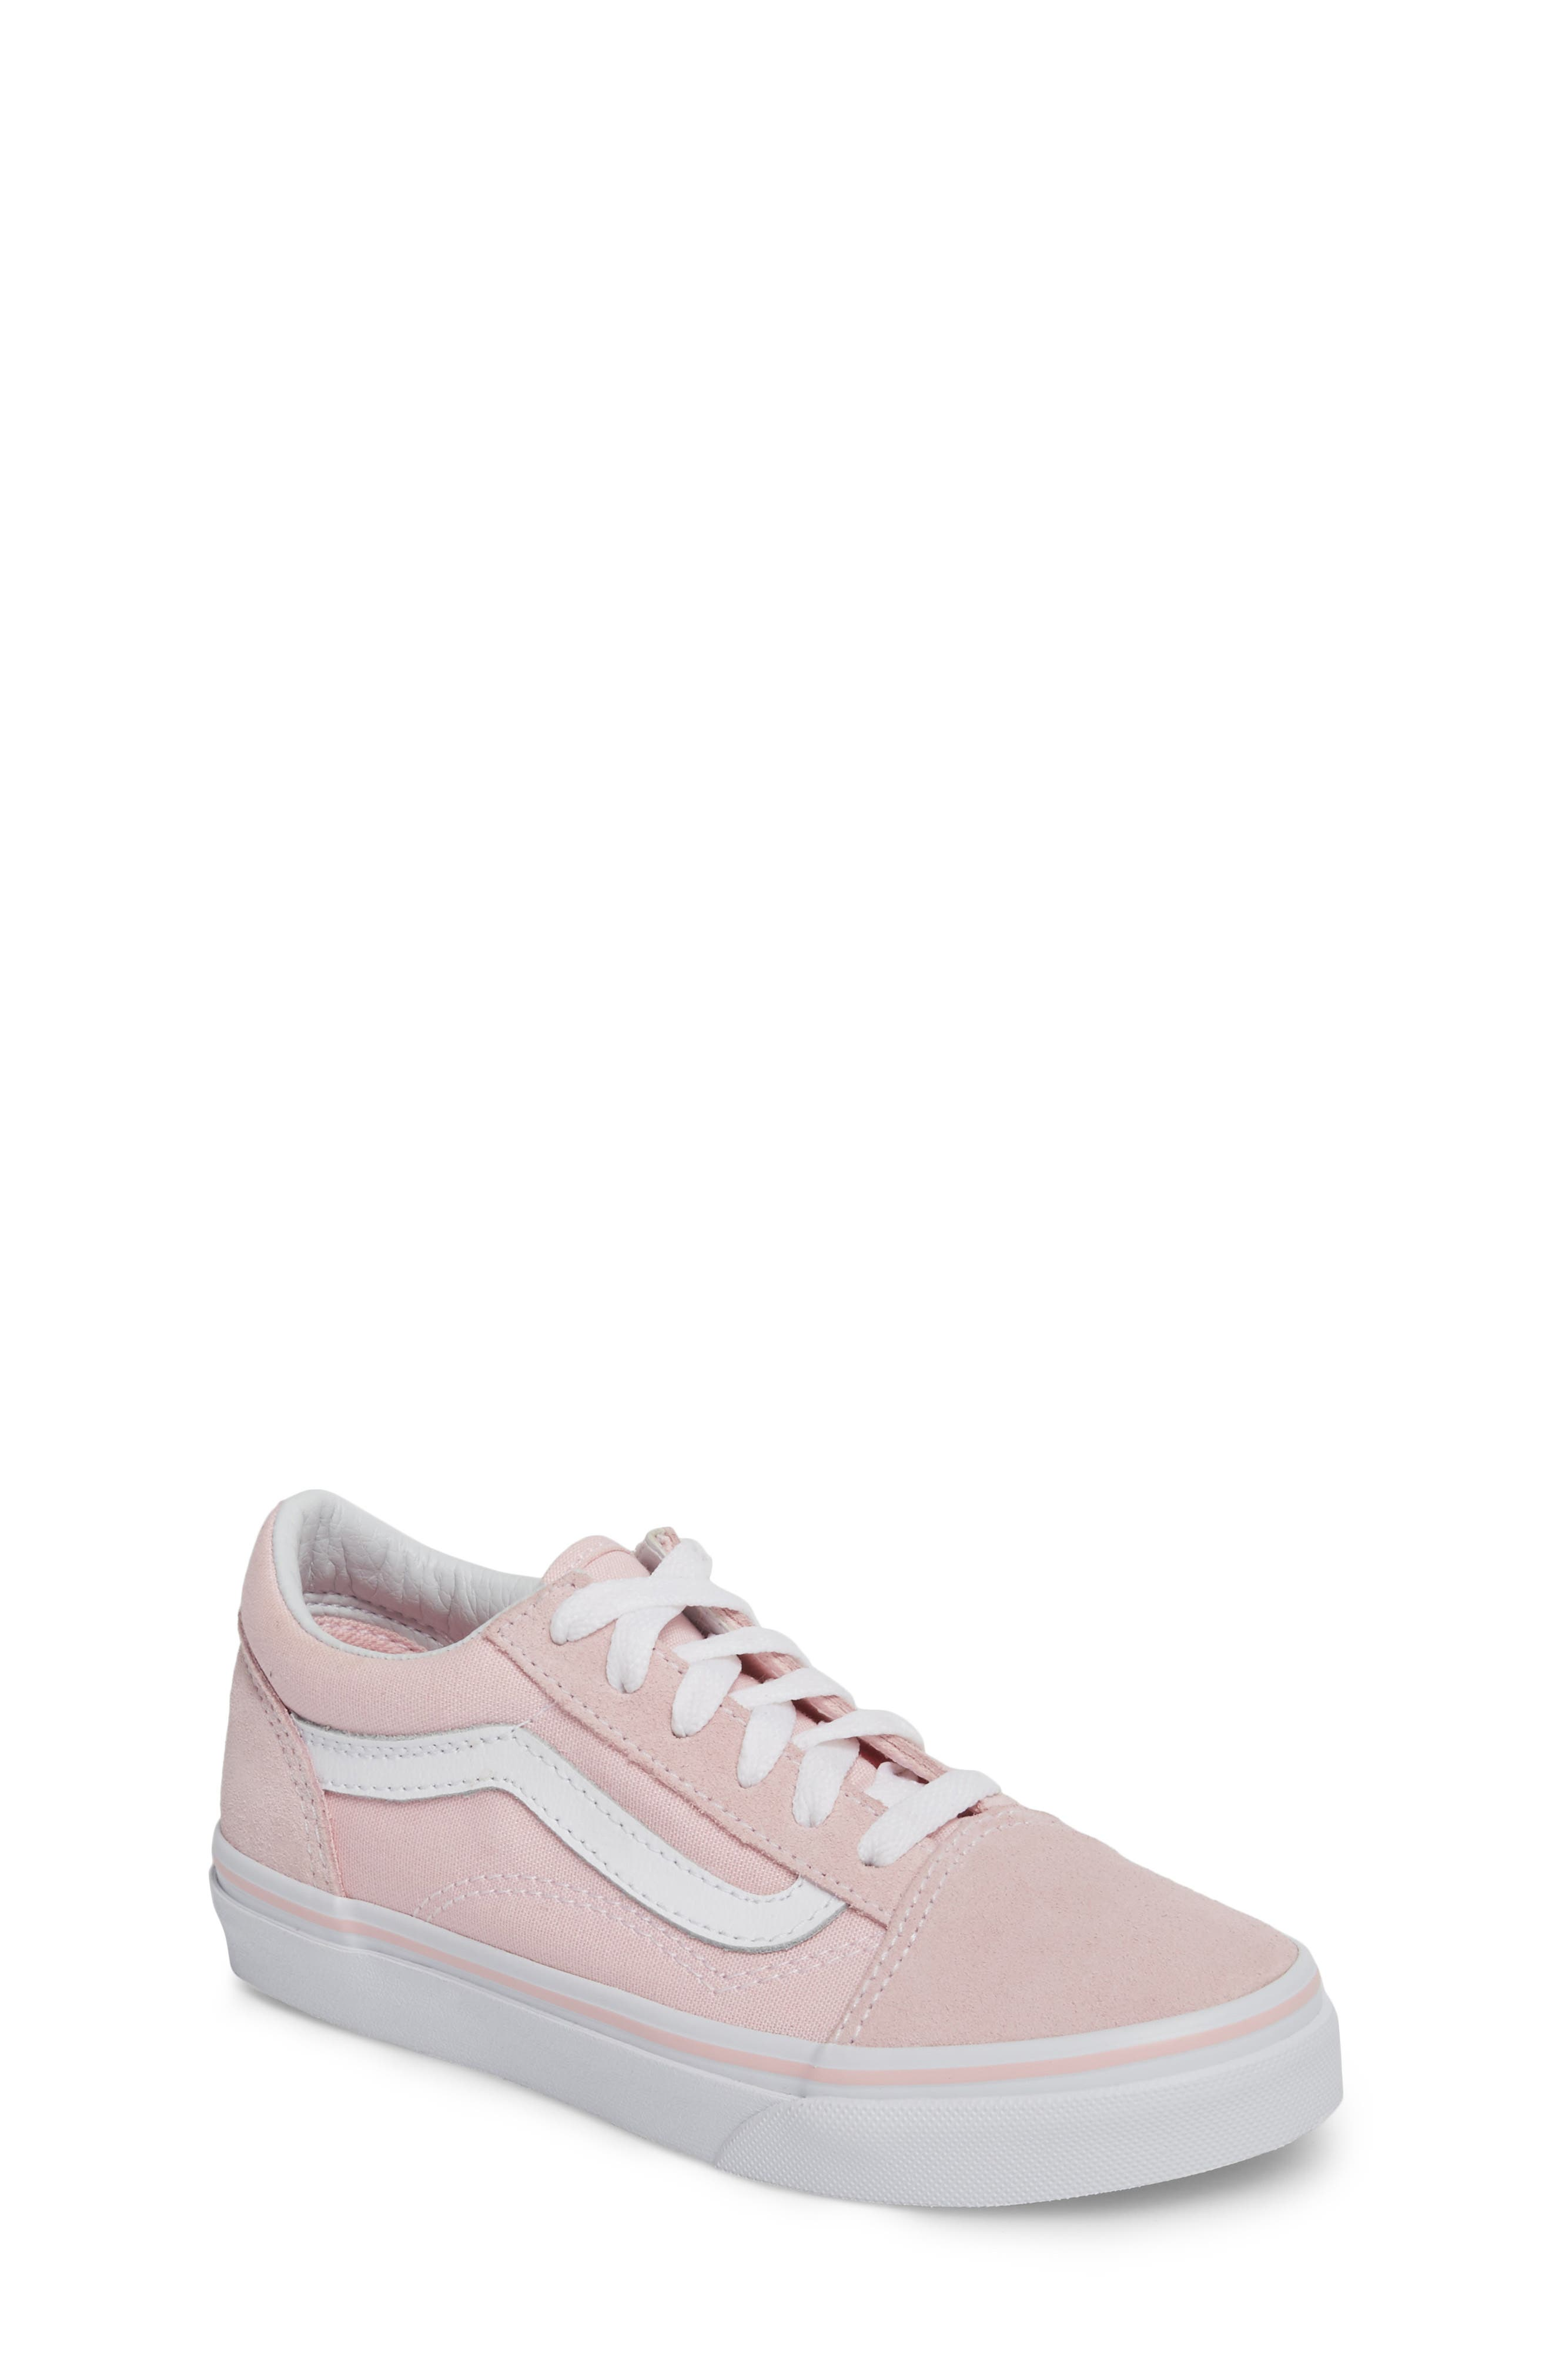 Old Skool Sneaker, Main, color, CHALK PINK/ TRUE WHITE